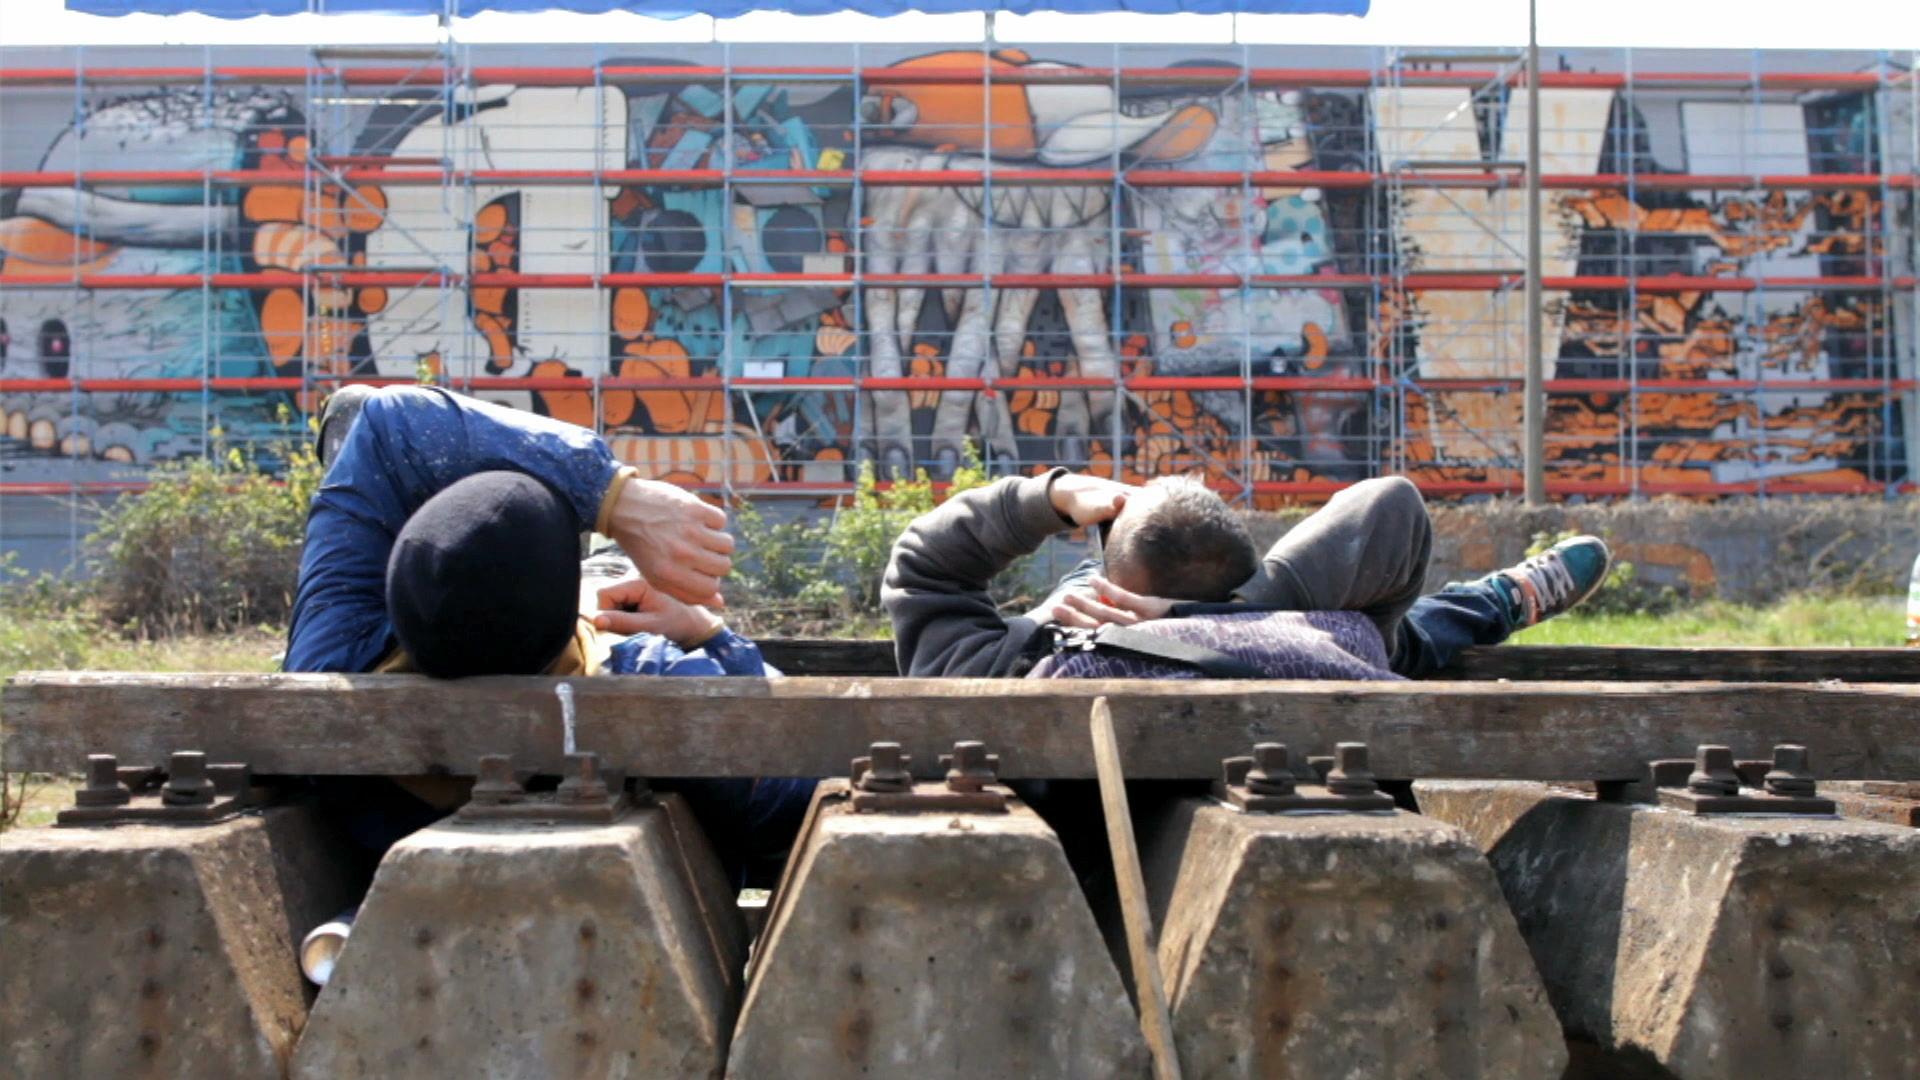 EDITUDE PICTURES Da Mental Vaporz: The Wall